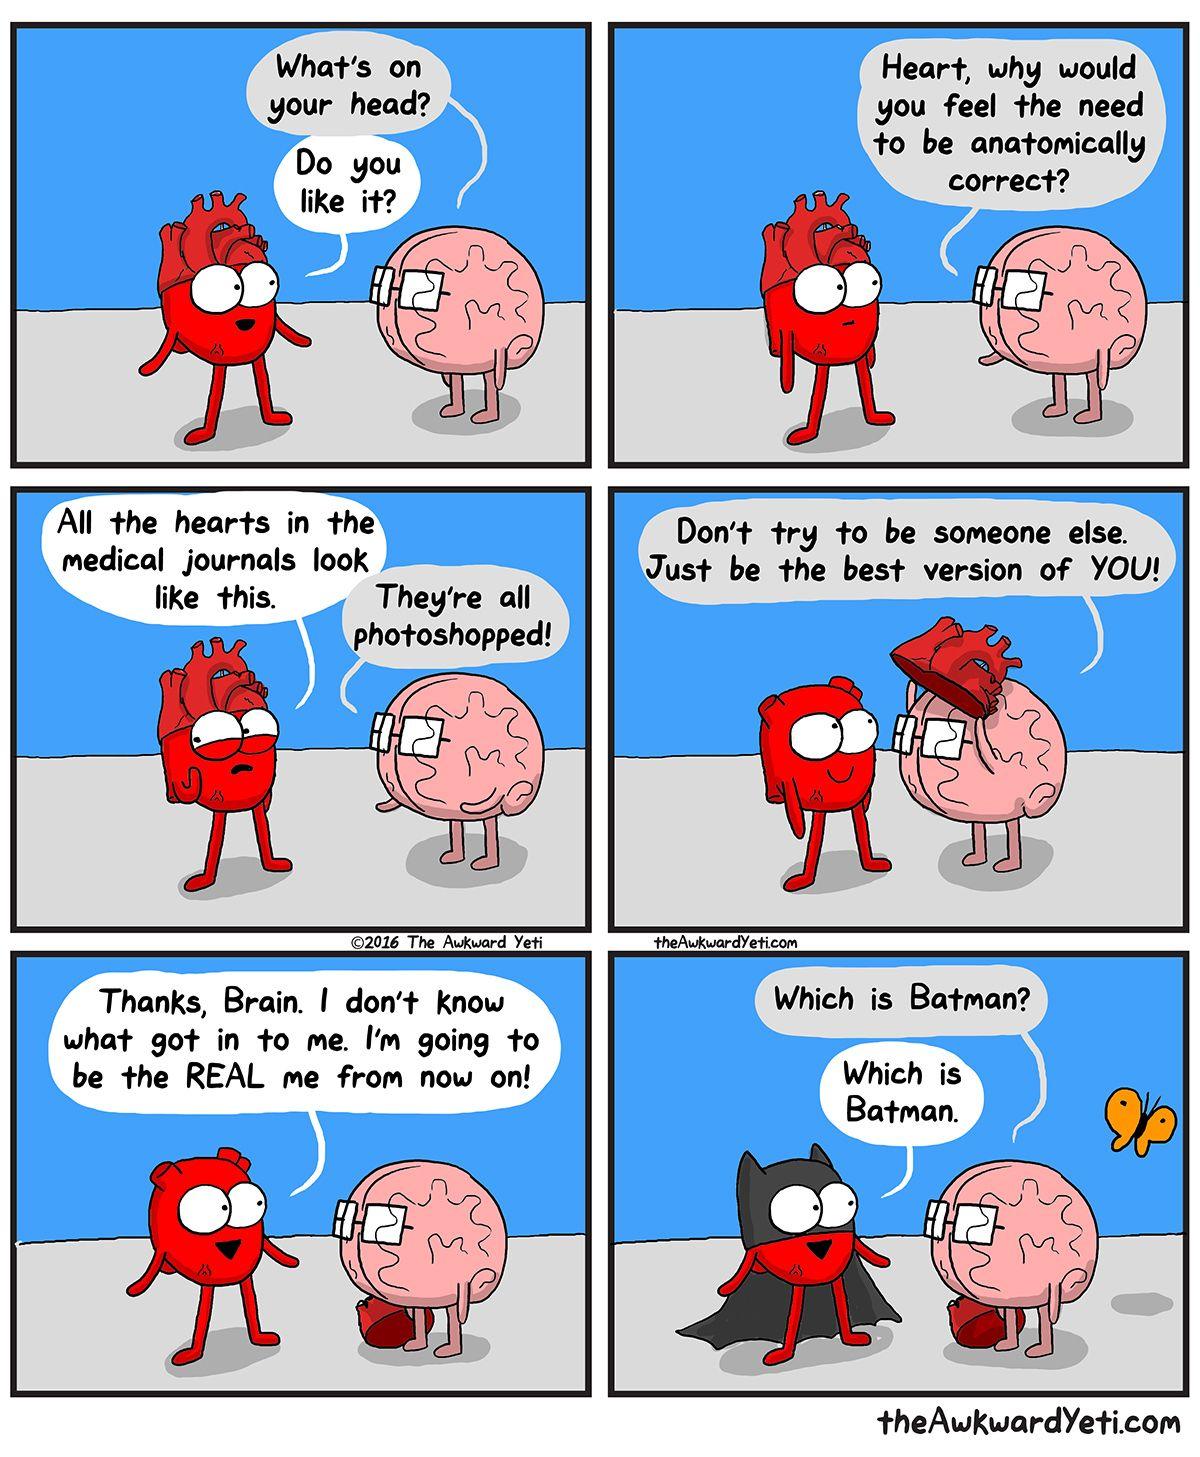 Awkward yeti image by Khira on Miscellaneous   Heart and brain comic, Funny  comics